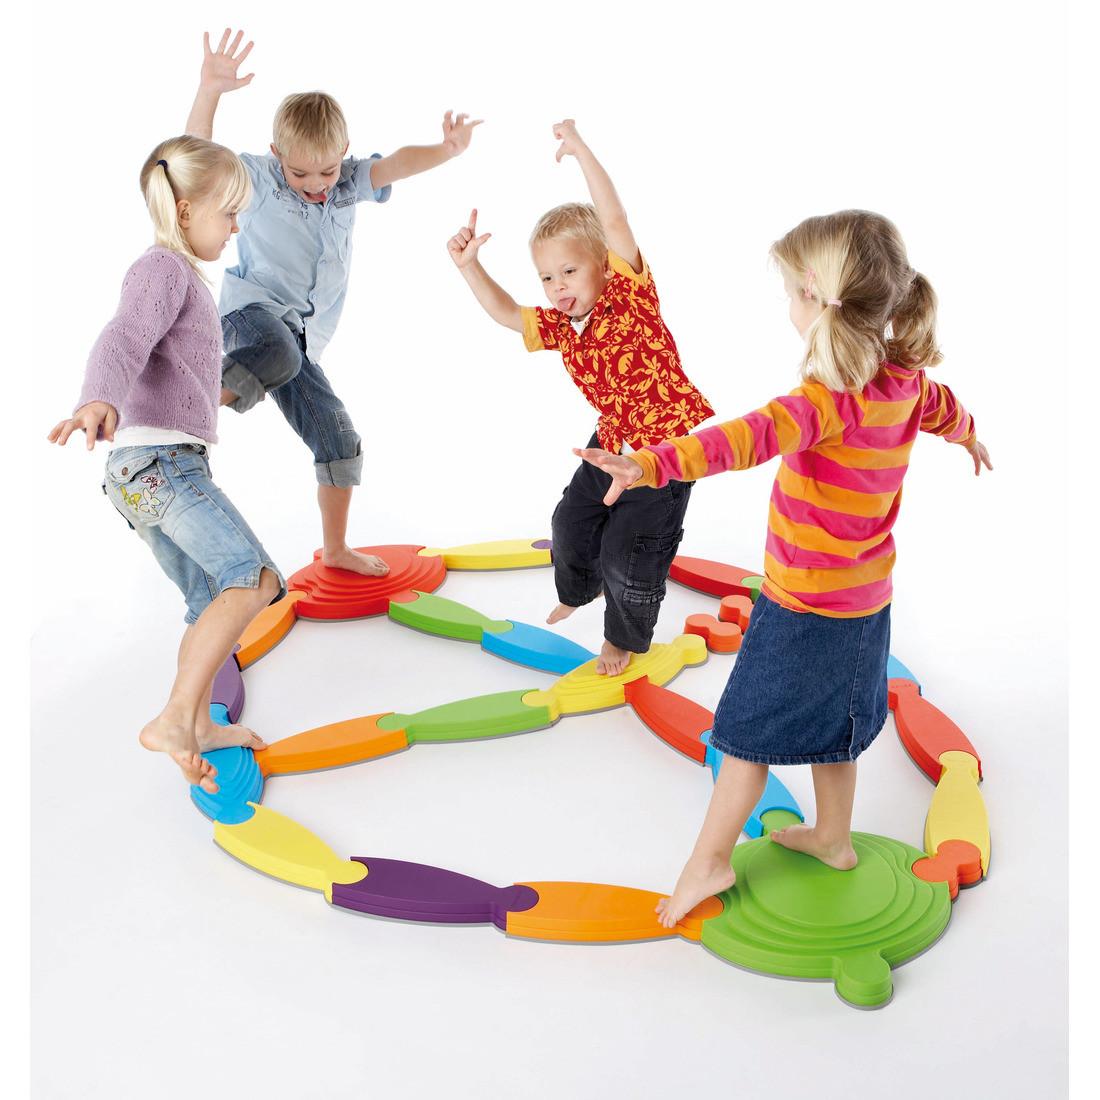 GONGE ゴンジ リバー・ランドスケープ | 幼稚園 保育園 遊具 室内遊具 屋外 おもちゃ 庭 外遊び ブロック 大人数 大型